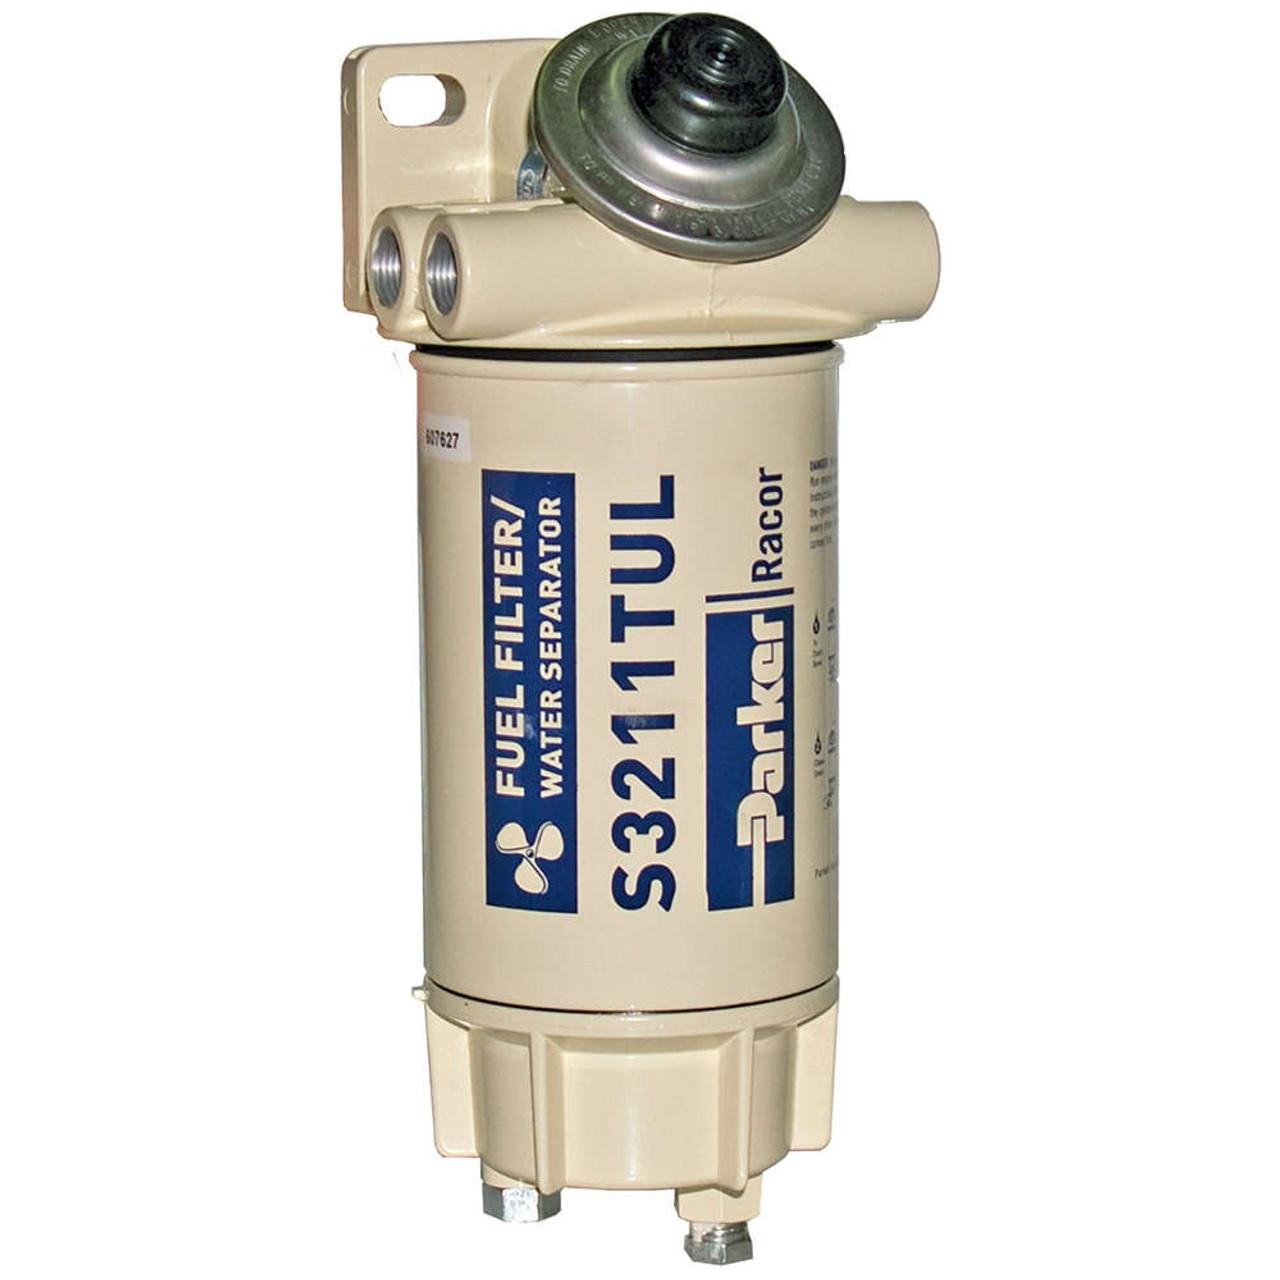 medium resolution of racor aquabloc marine 3 8 in 60 gph spin on diesel fuel filter water separator assembly 6 qty john m ellsworth co inc